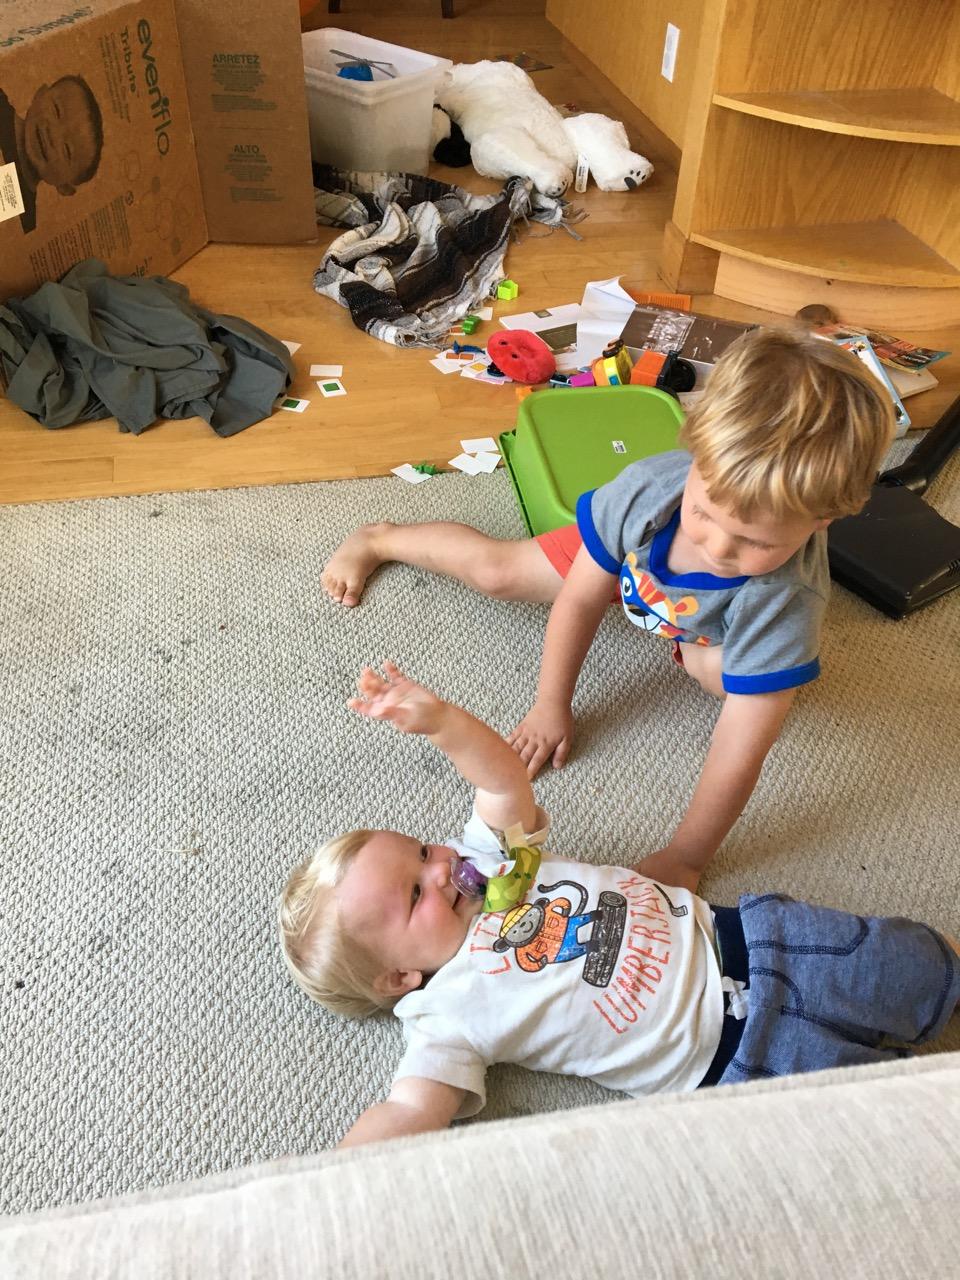 Arthur playing tiger attack